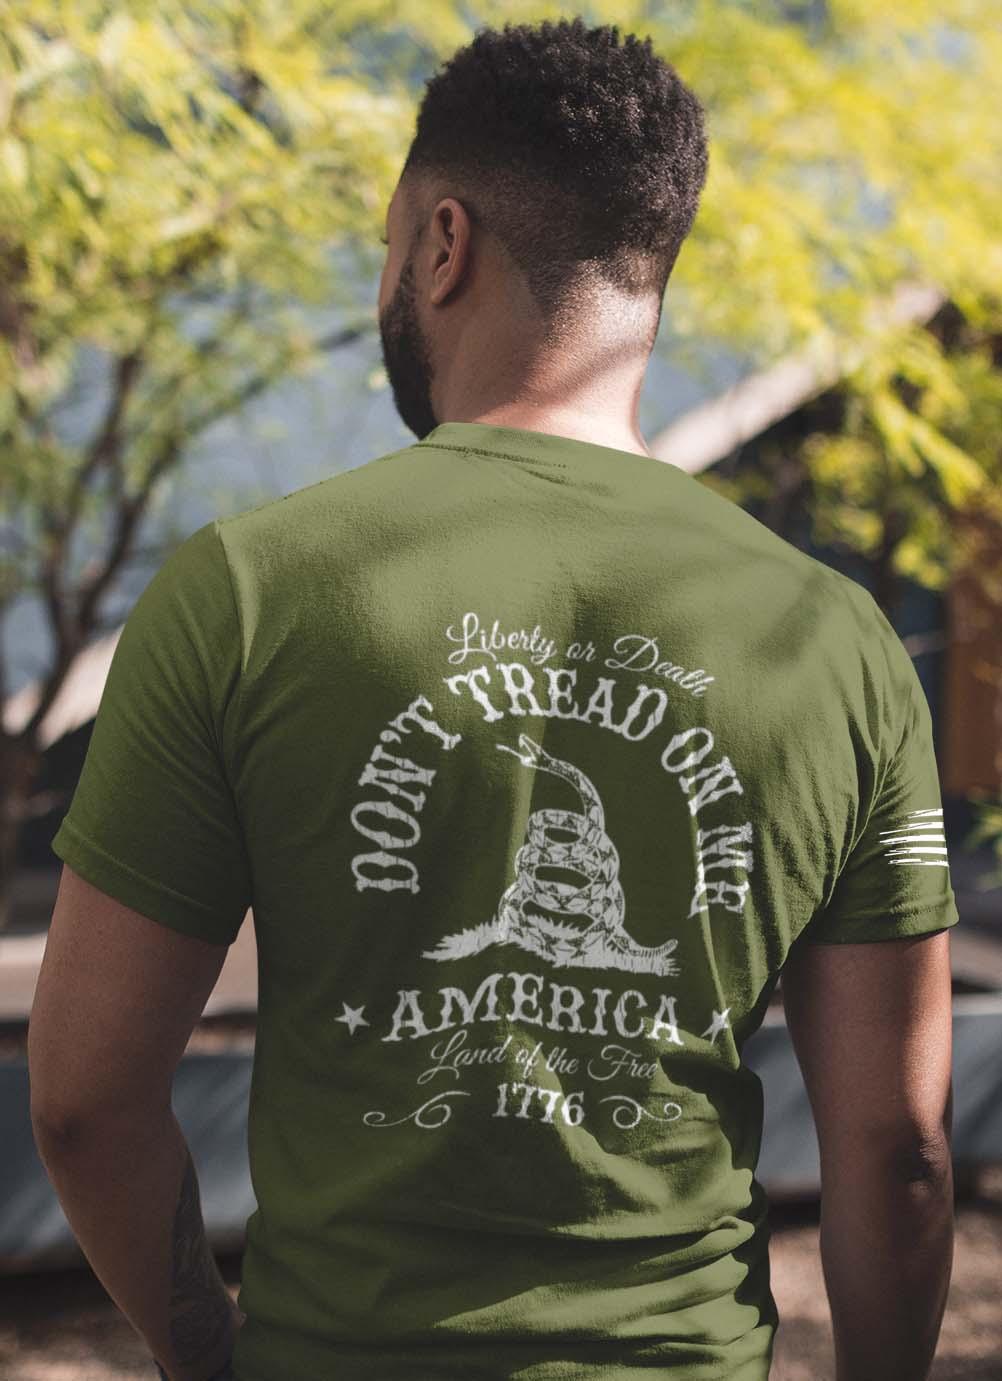 Dont tread on me on mens Army tshirt